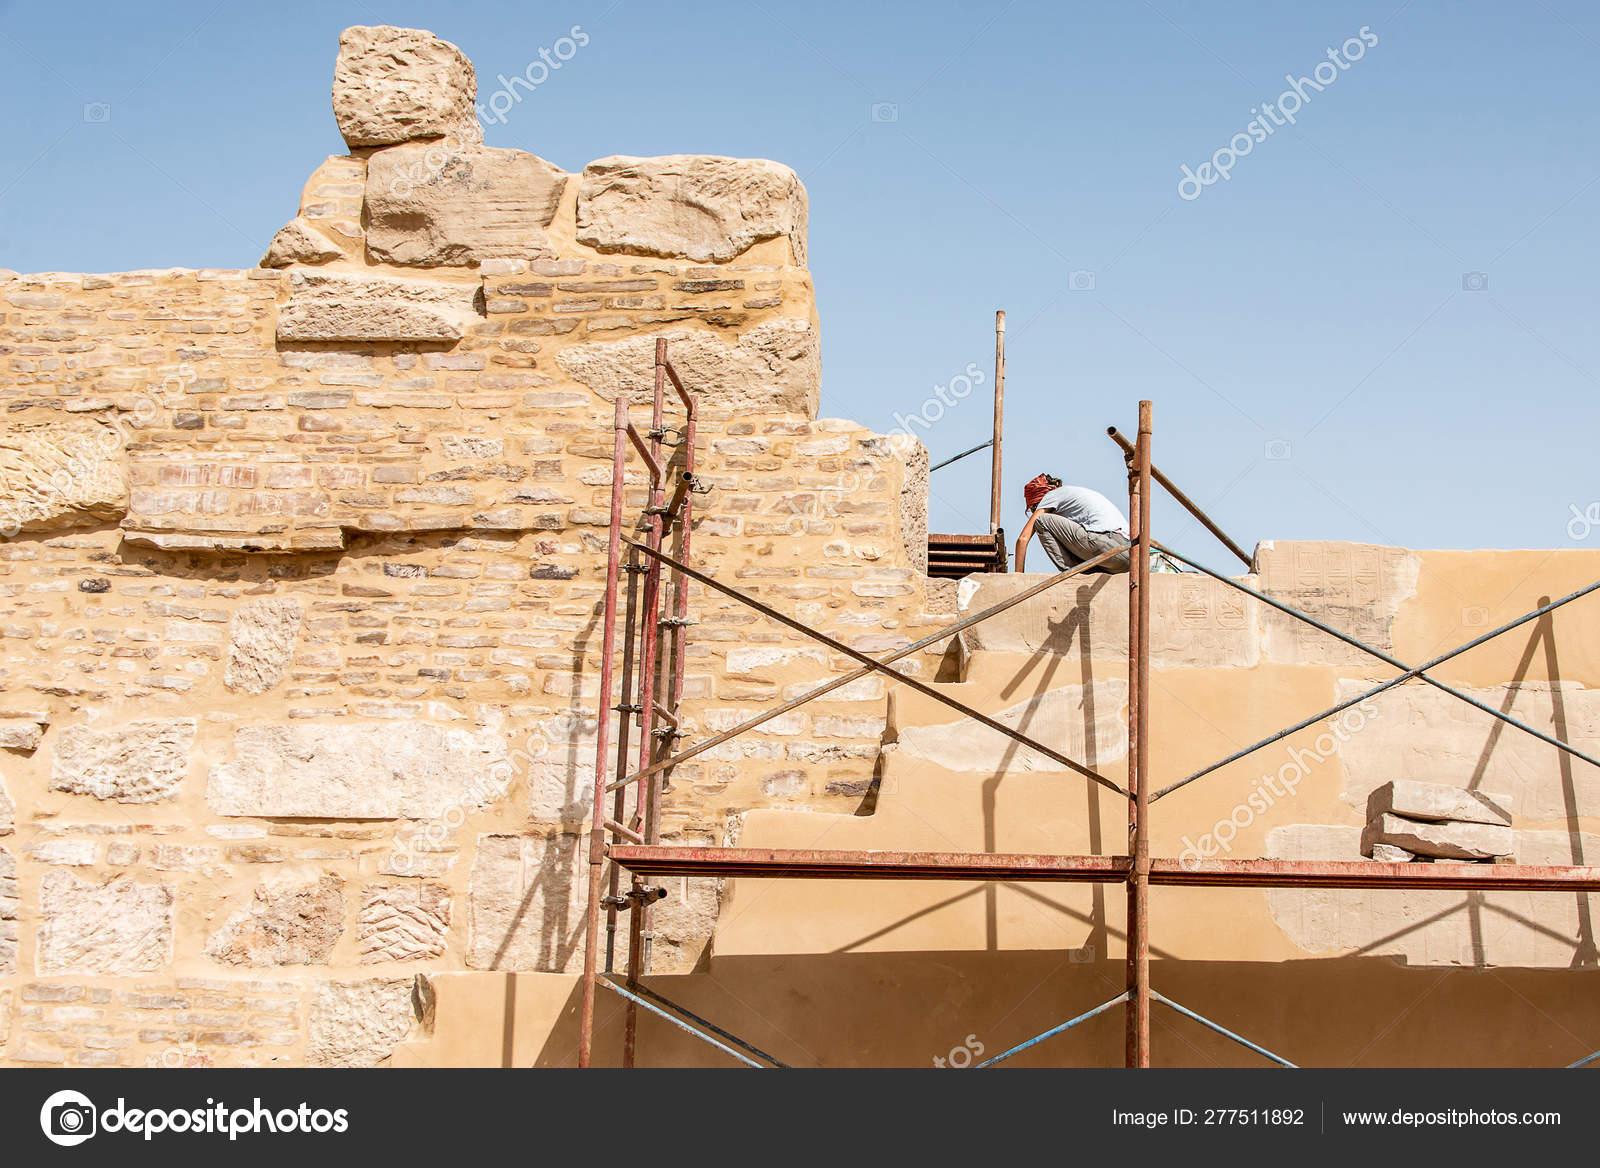 Luxor Egypt 23 05 2018 archaeologist working restoring